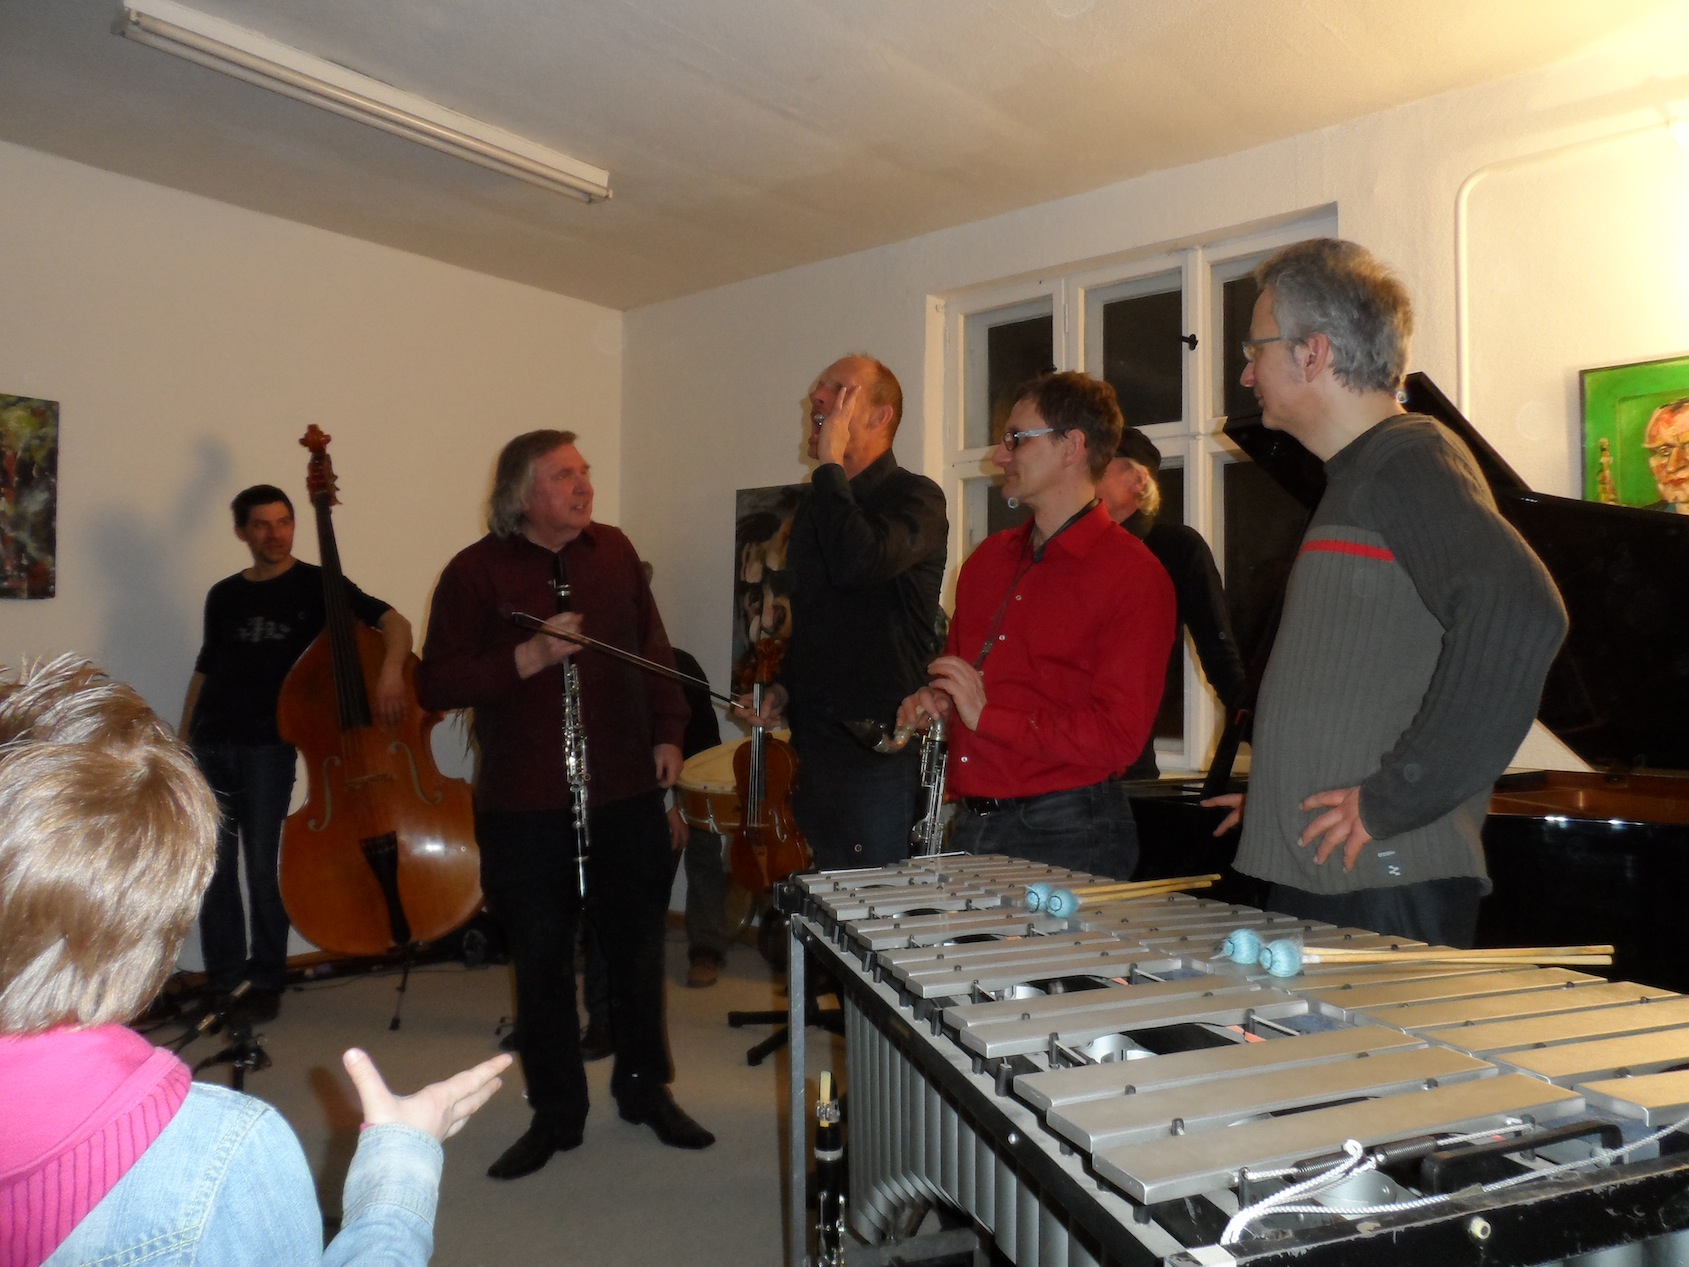 Theo jorgensmann and friends